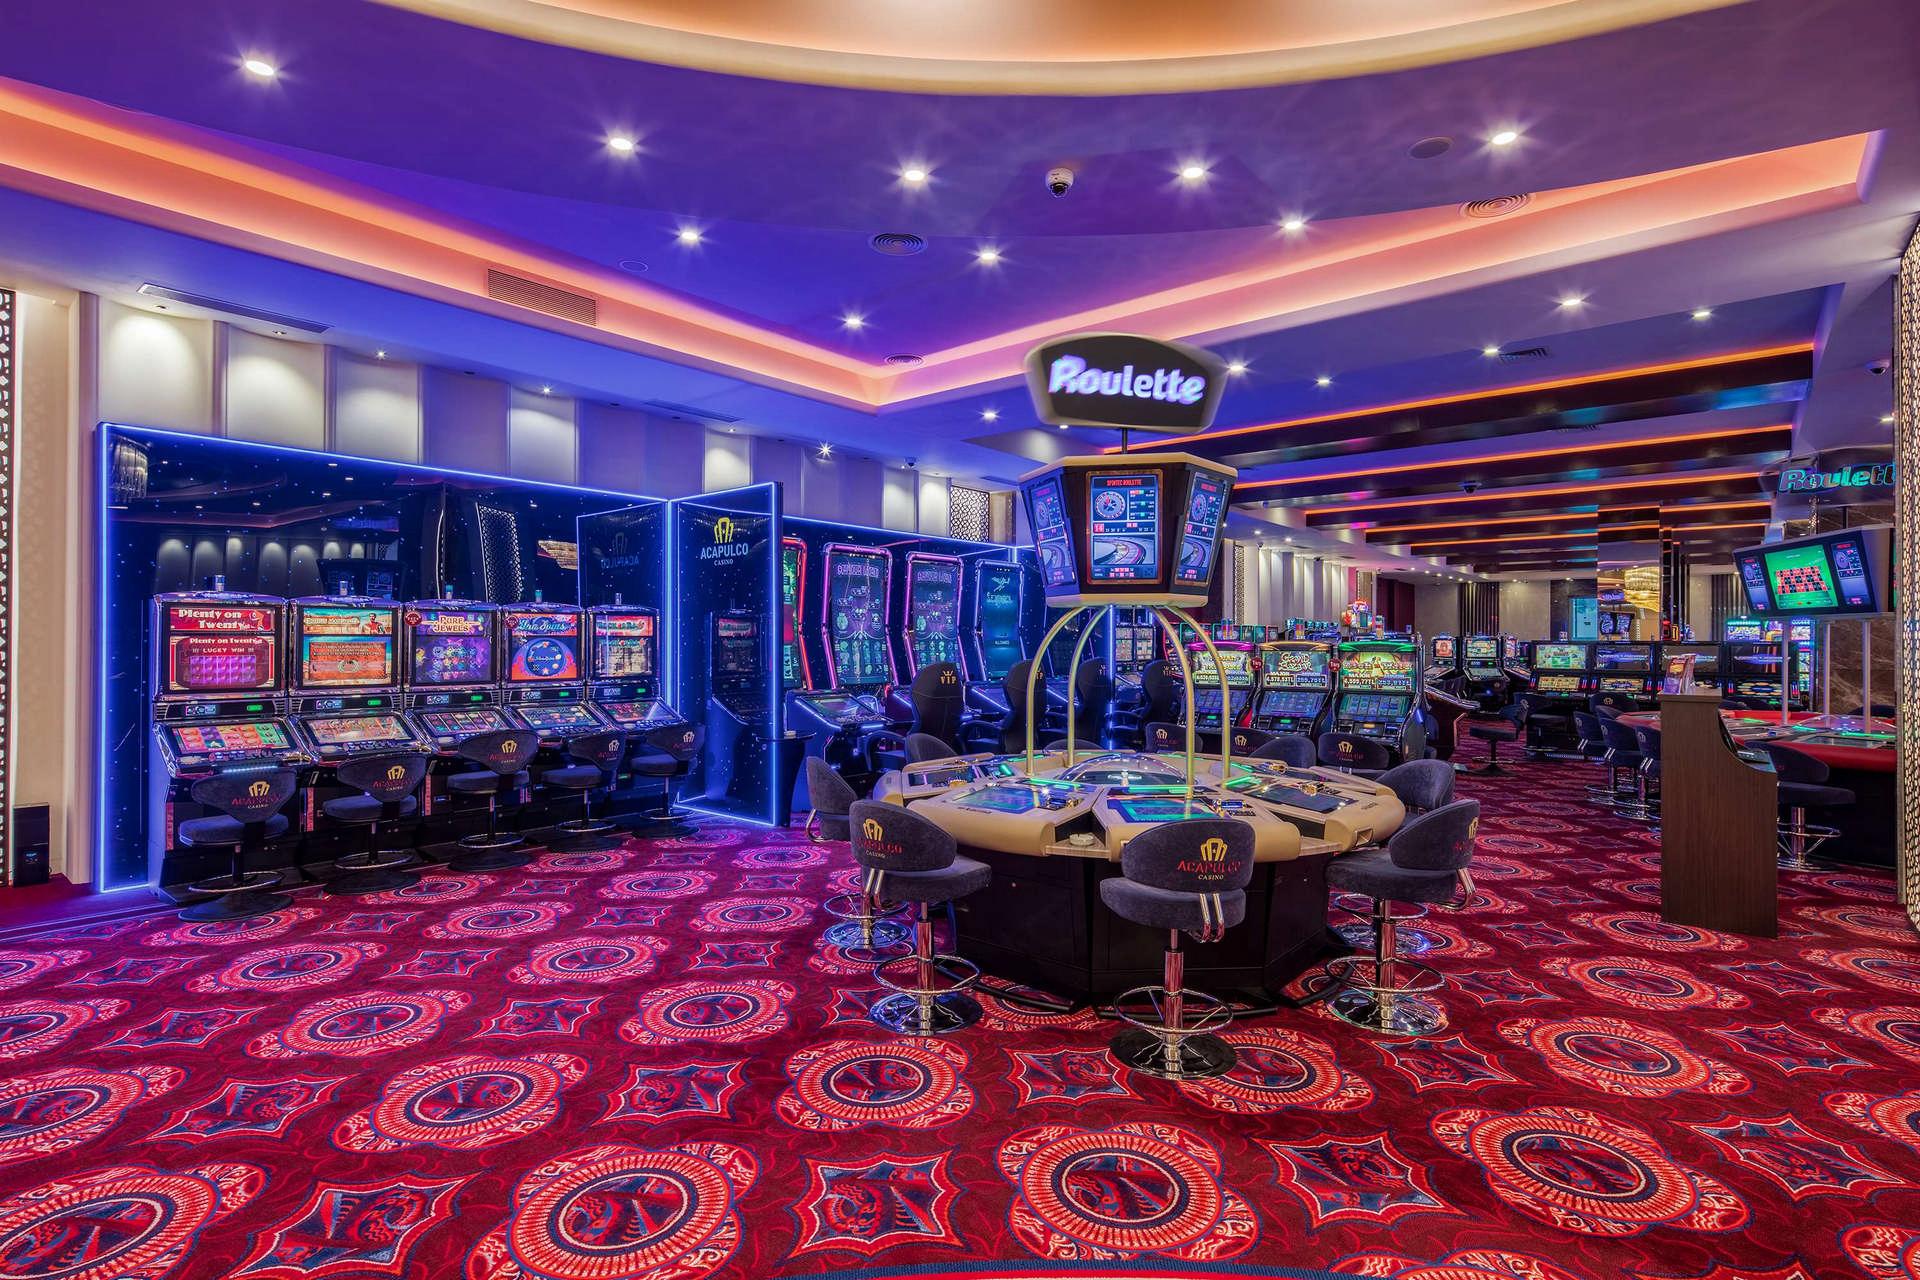 acapulco-resort-spa-casino-709